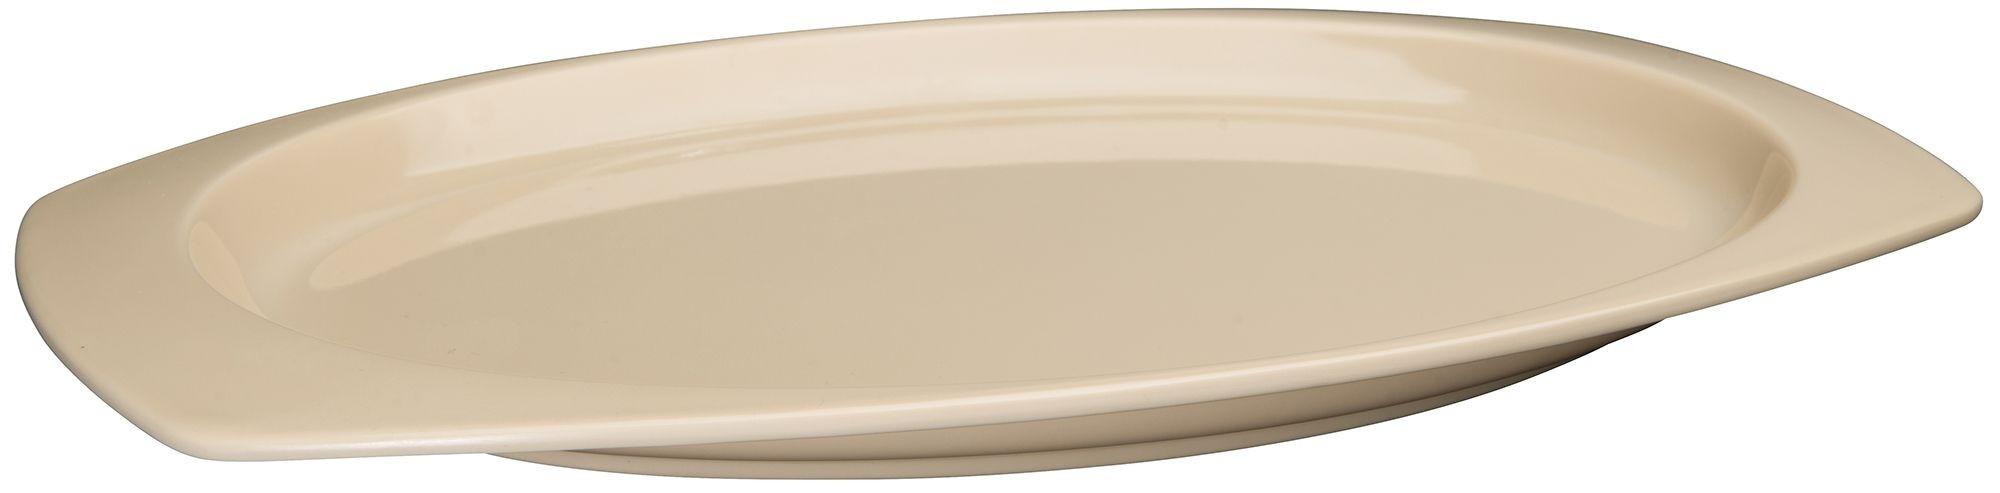 "Winco MMPT-1510 Tan Melamine Rectangular Platter, 15"" x 10-5/8"""